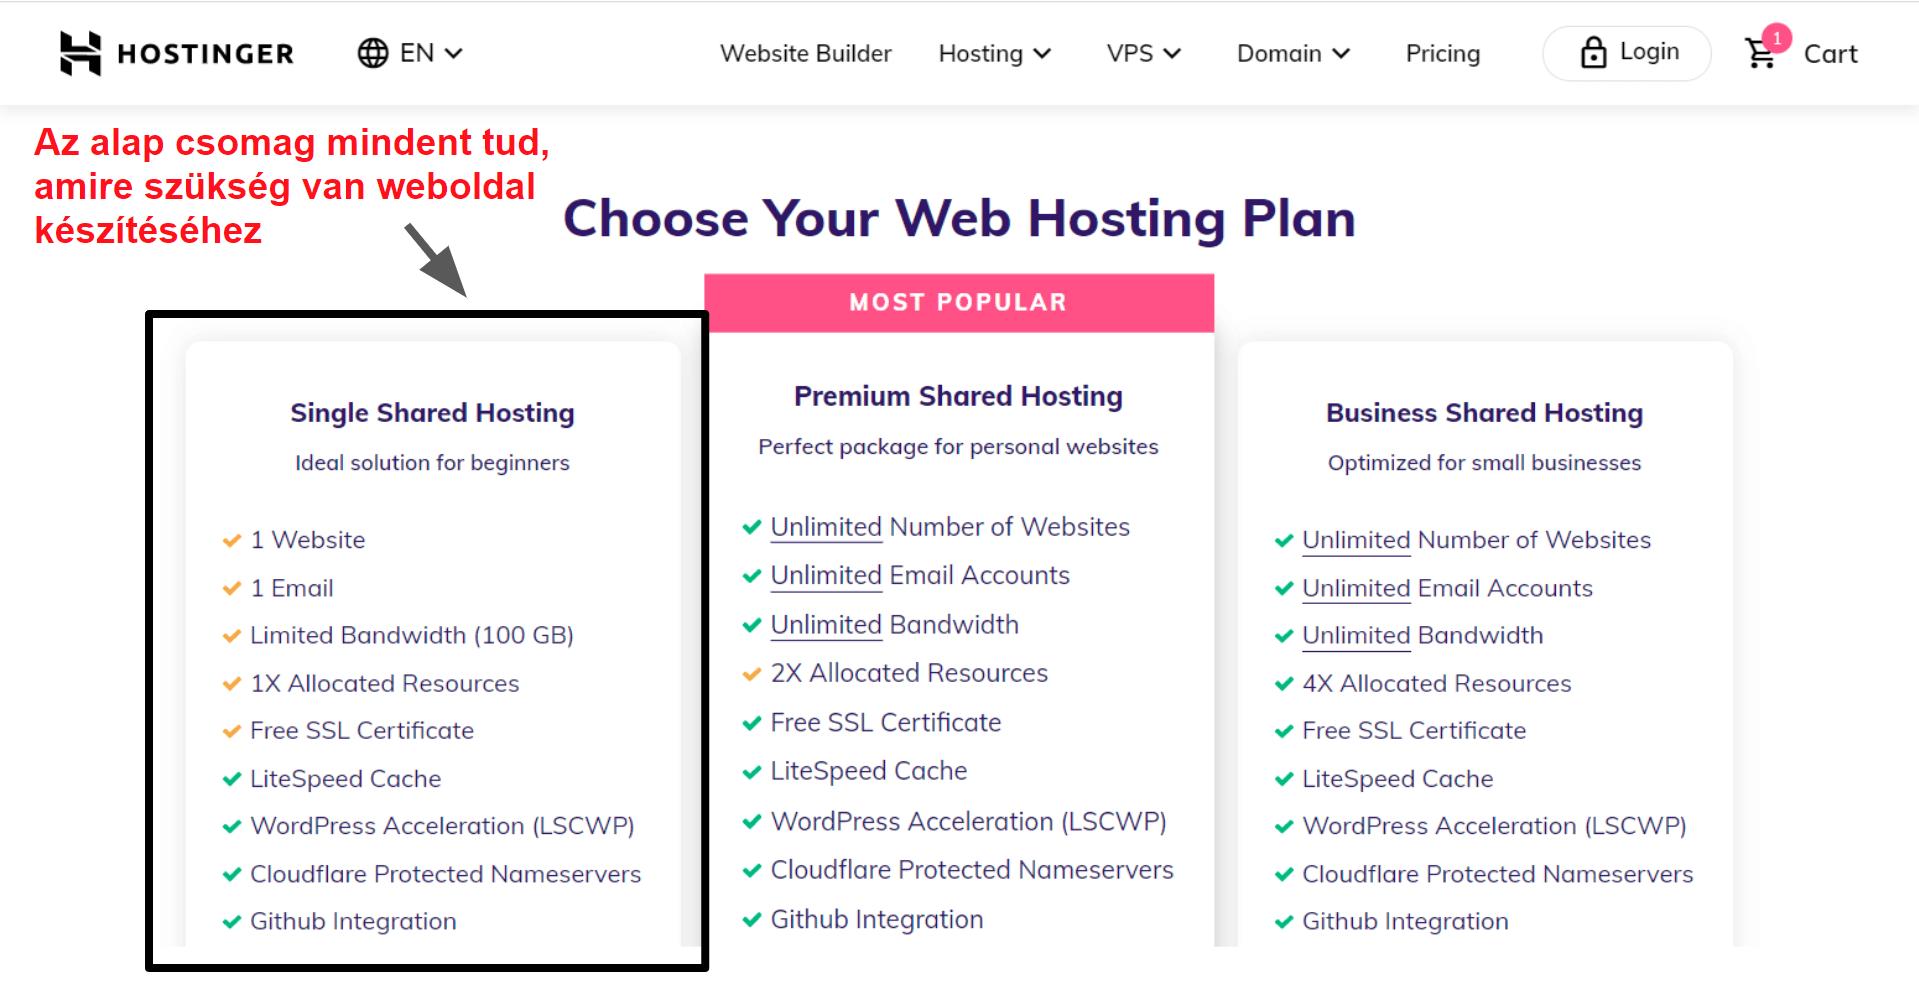 hosting plan features_HU